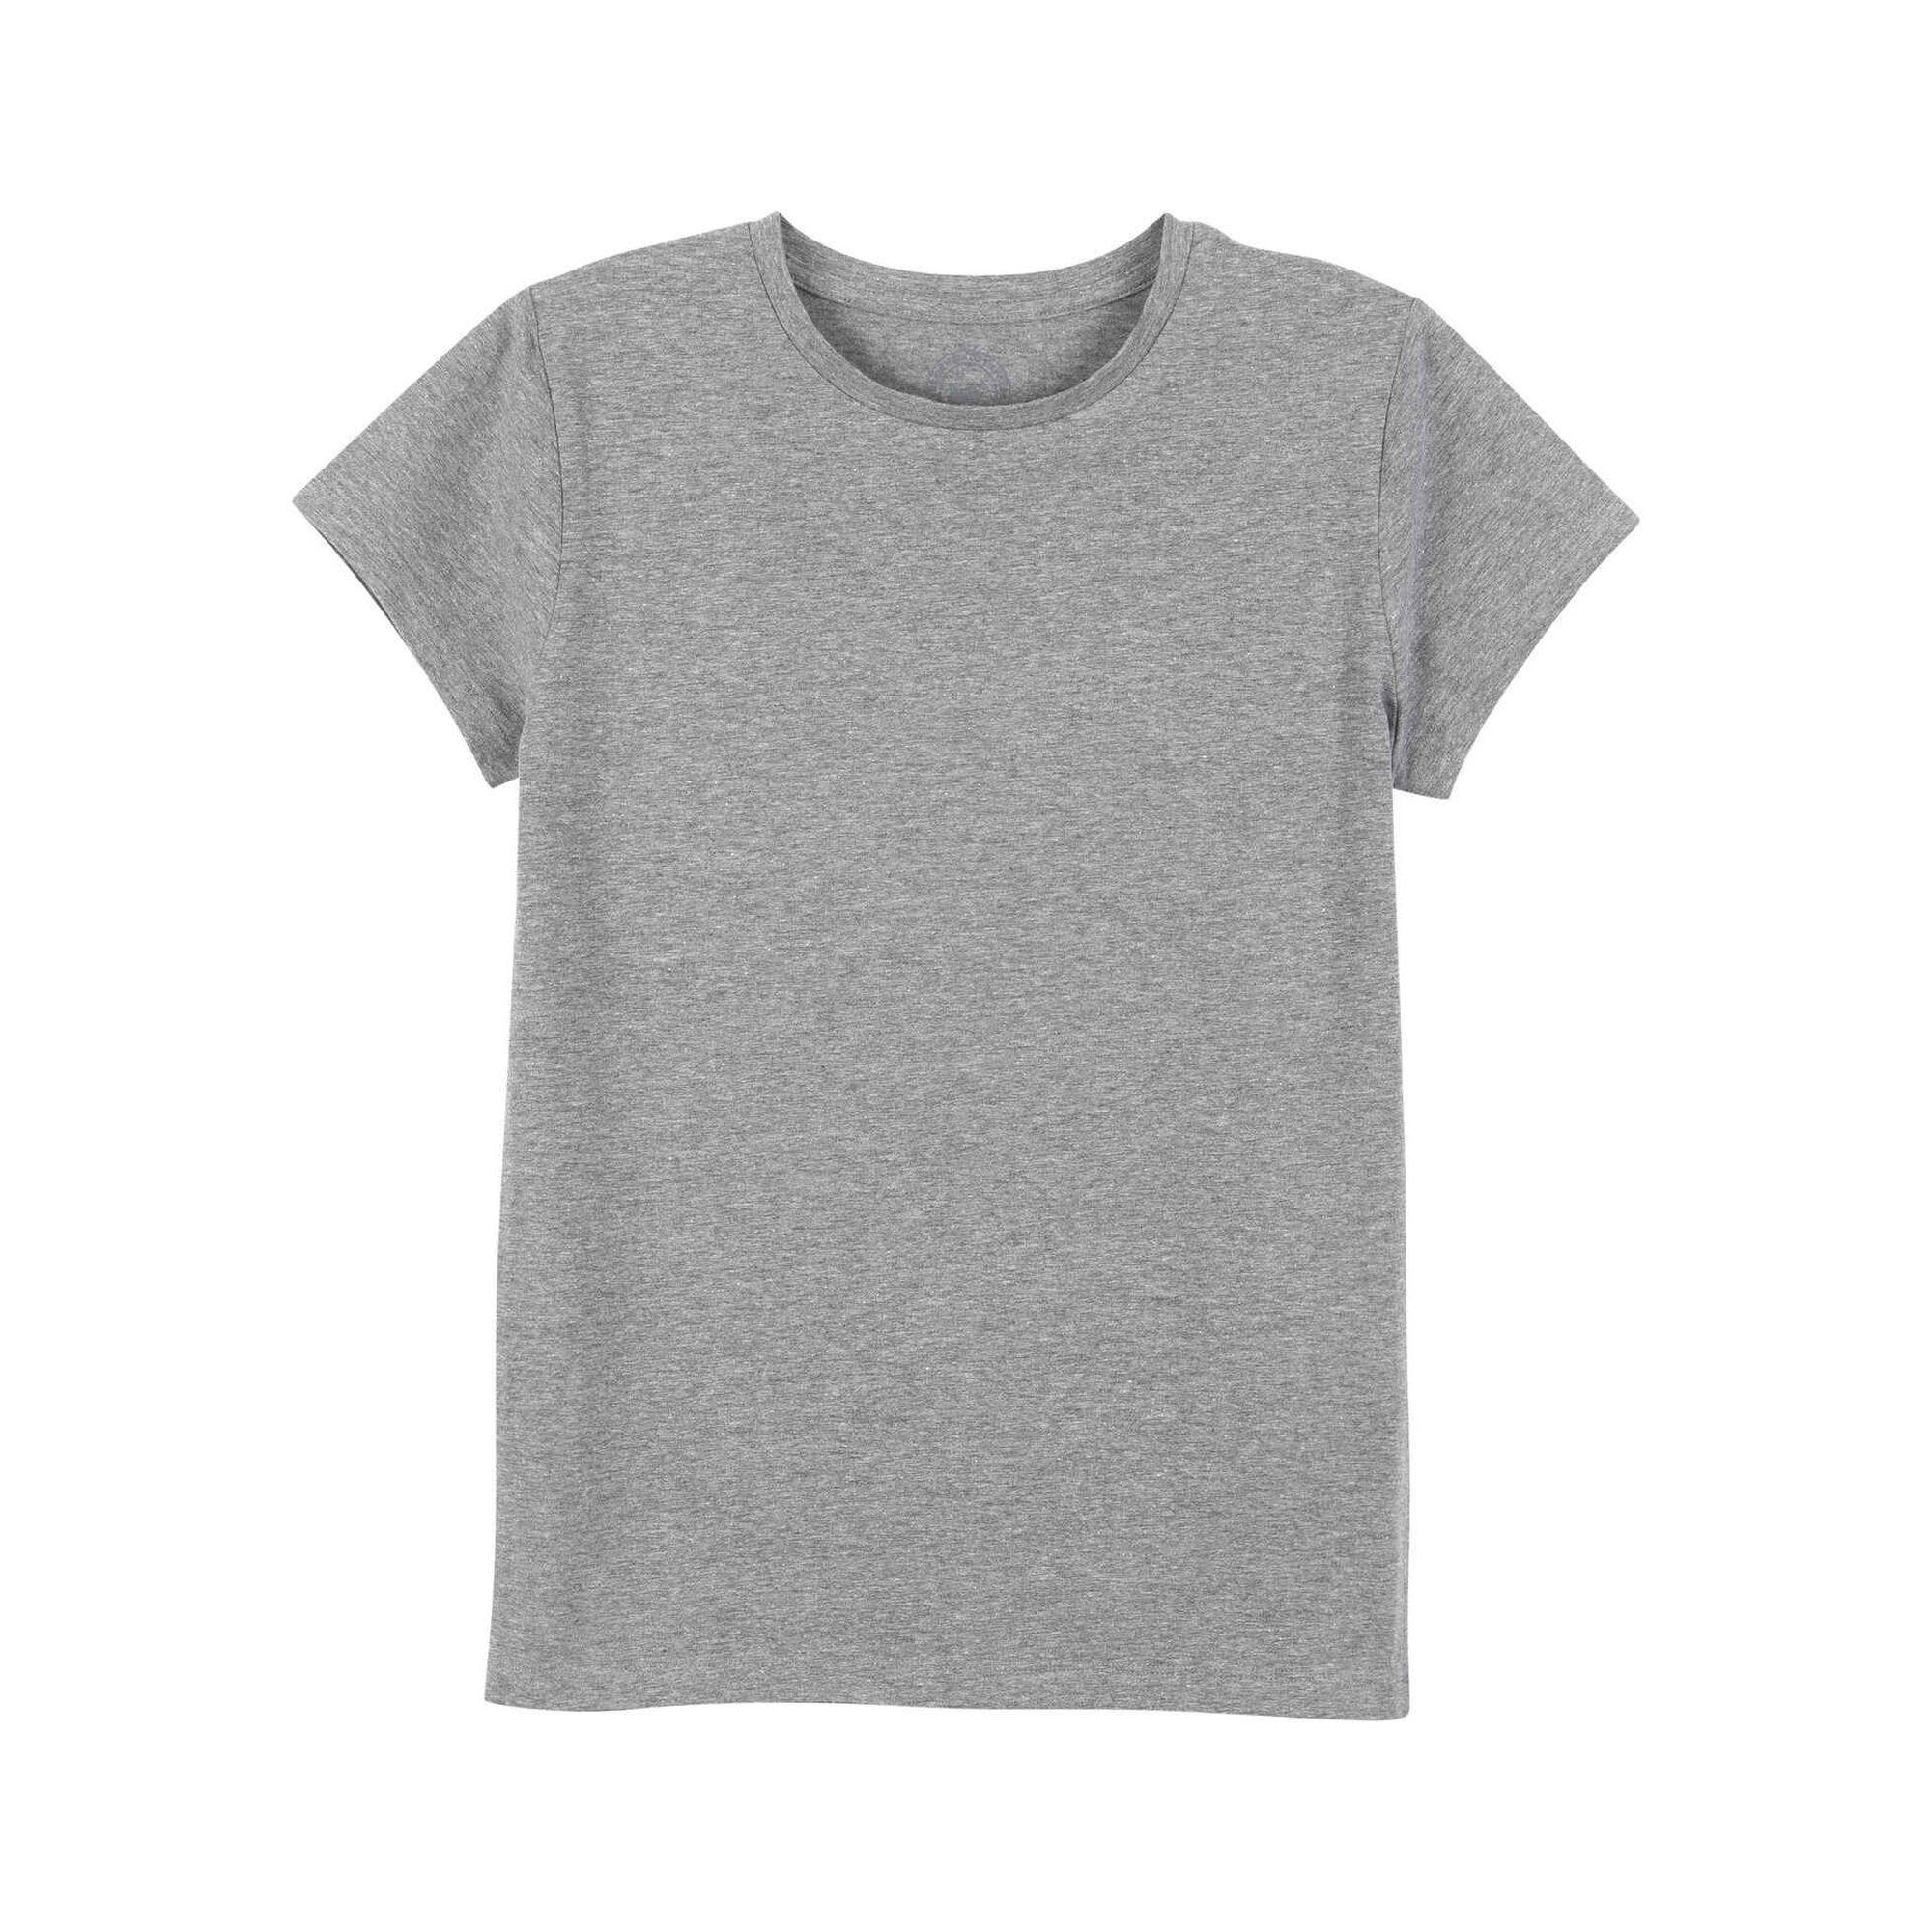 T-shirt S Cinza